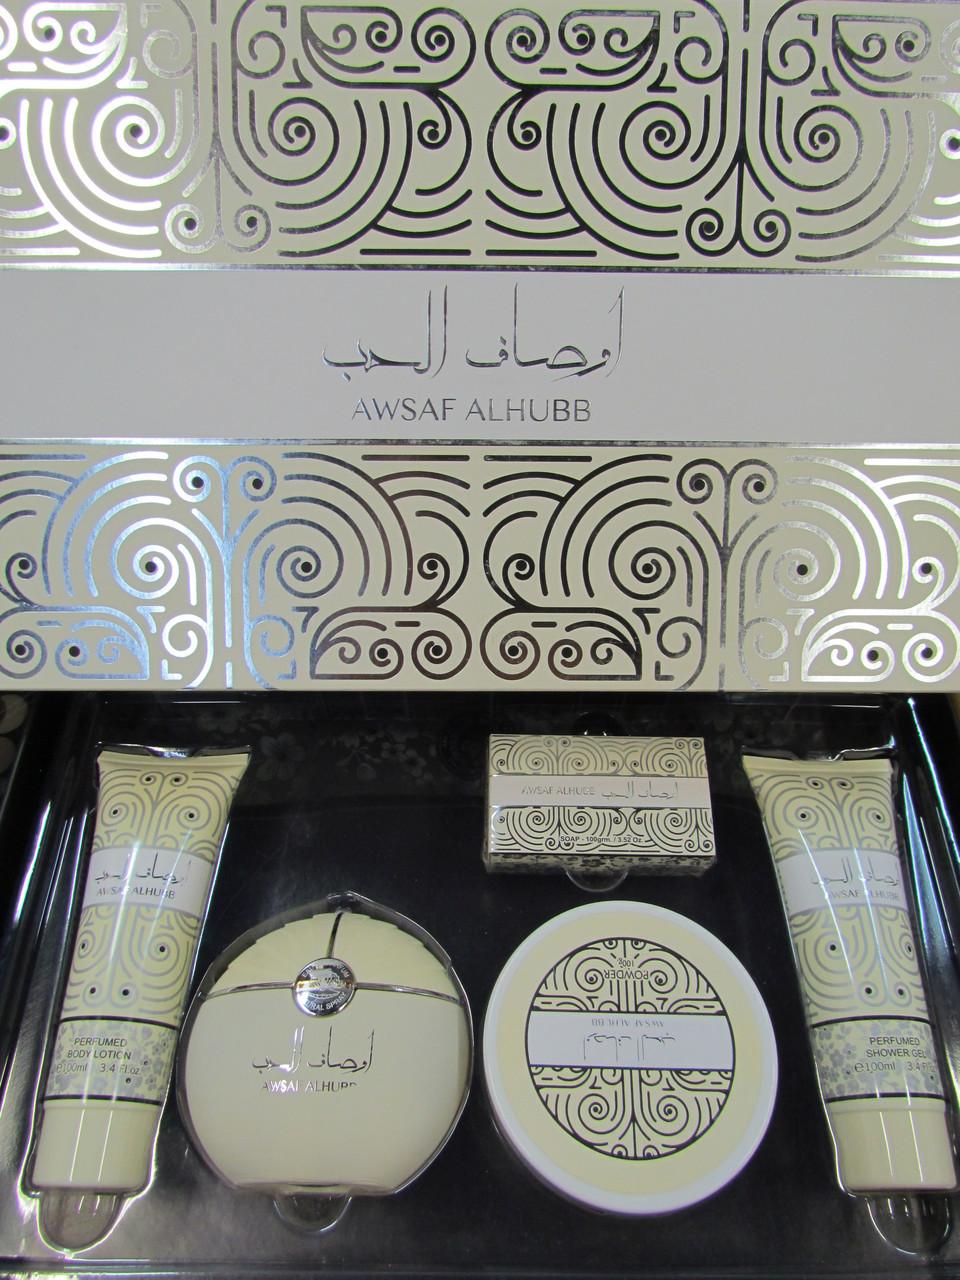 Парфюмерно - косметический сет для женщин Ard Al Zaafaran Awsaf Al Hub 100мл +